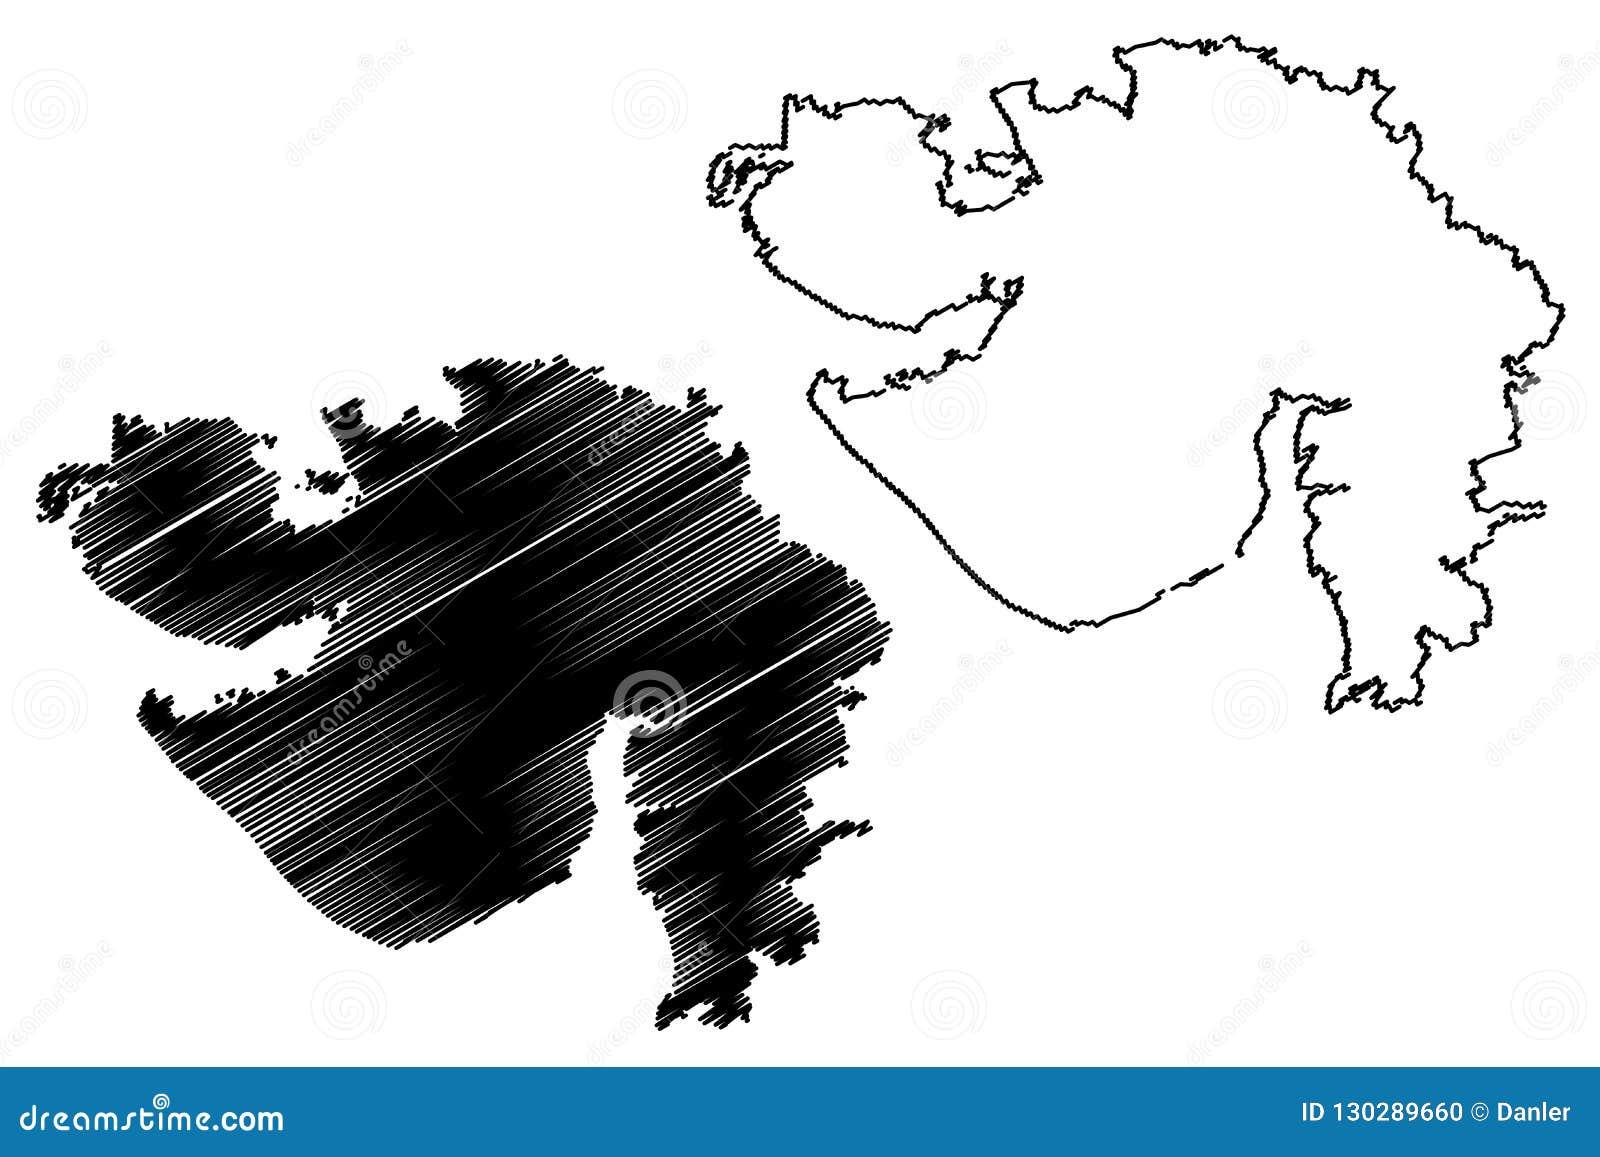 Gujarat map vector stock vector. Illustration of ahmedabad - 130289660